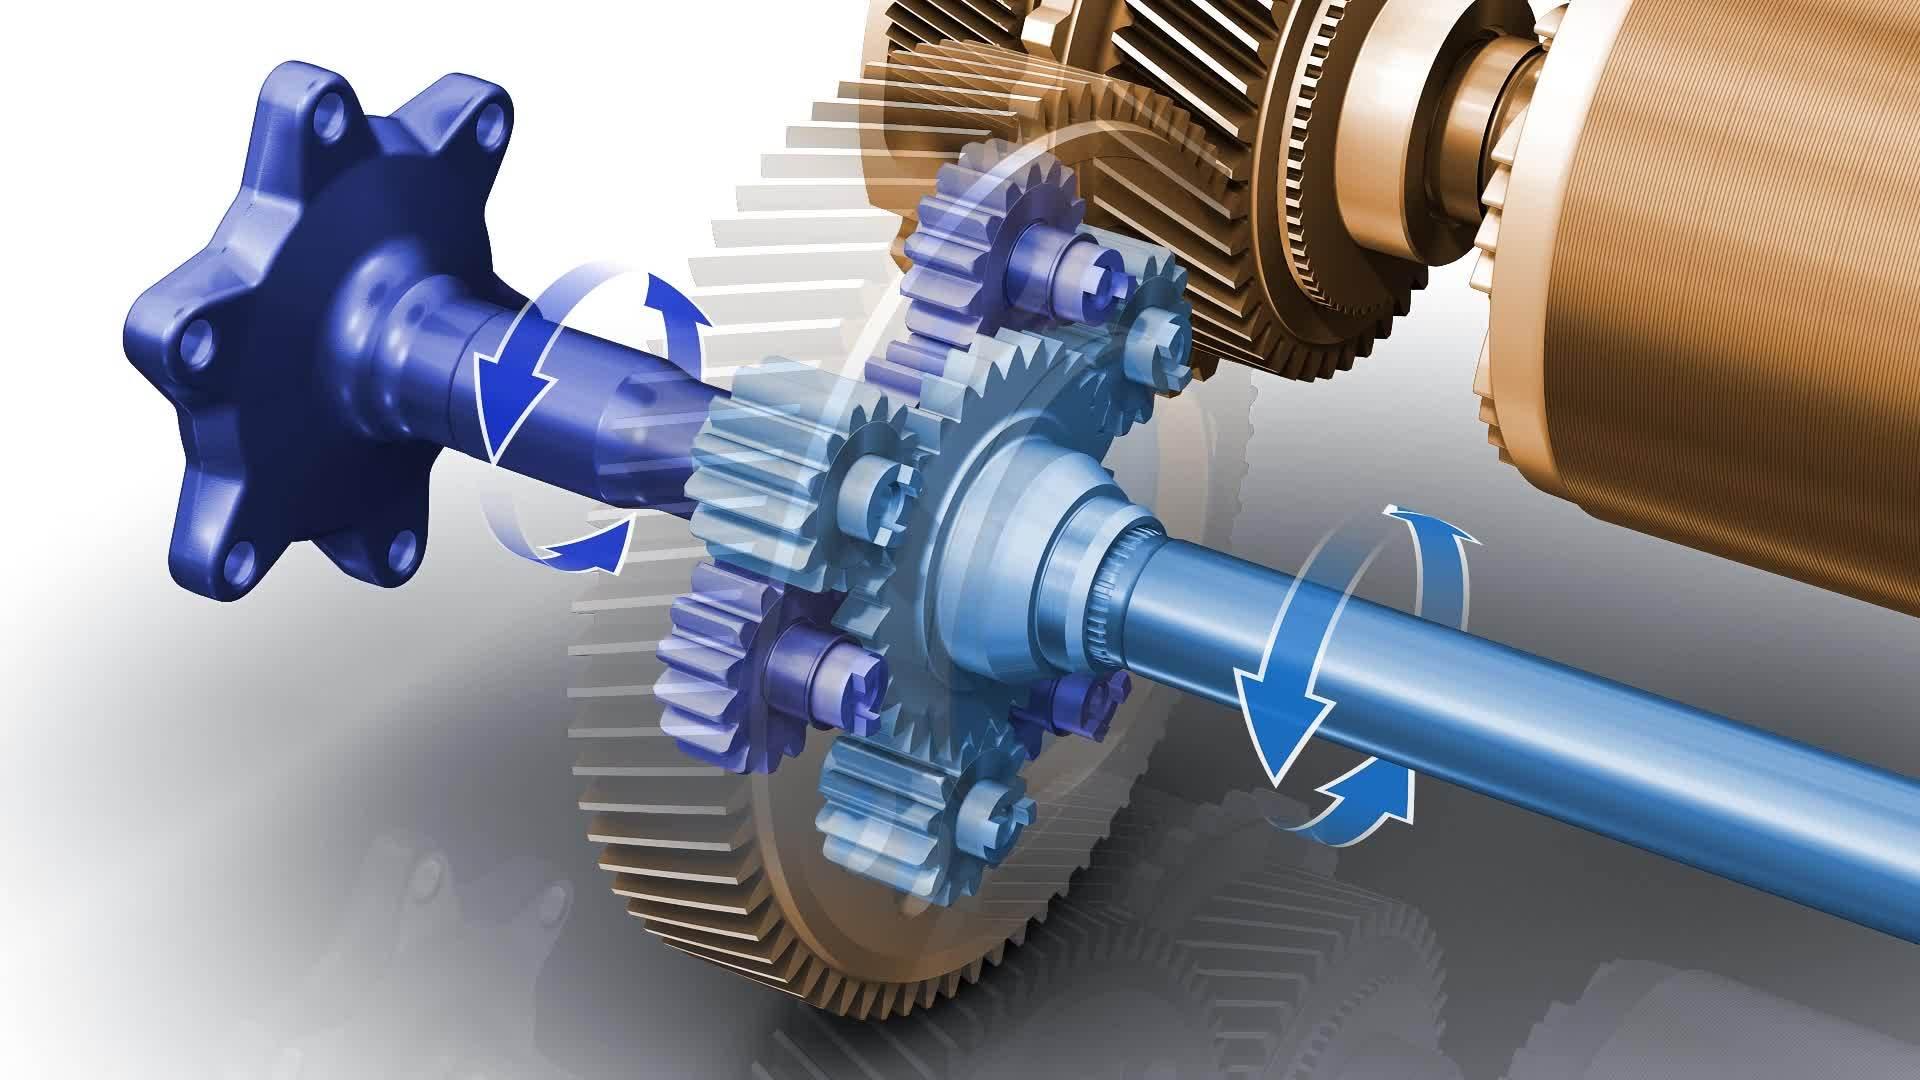 Audi e-tron Getriebe E-Motor (Animation )